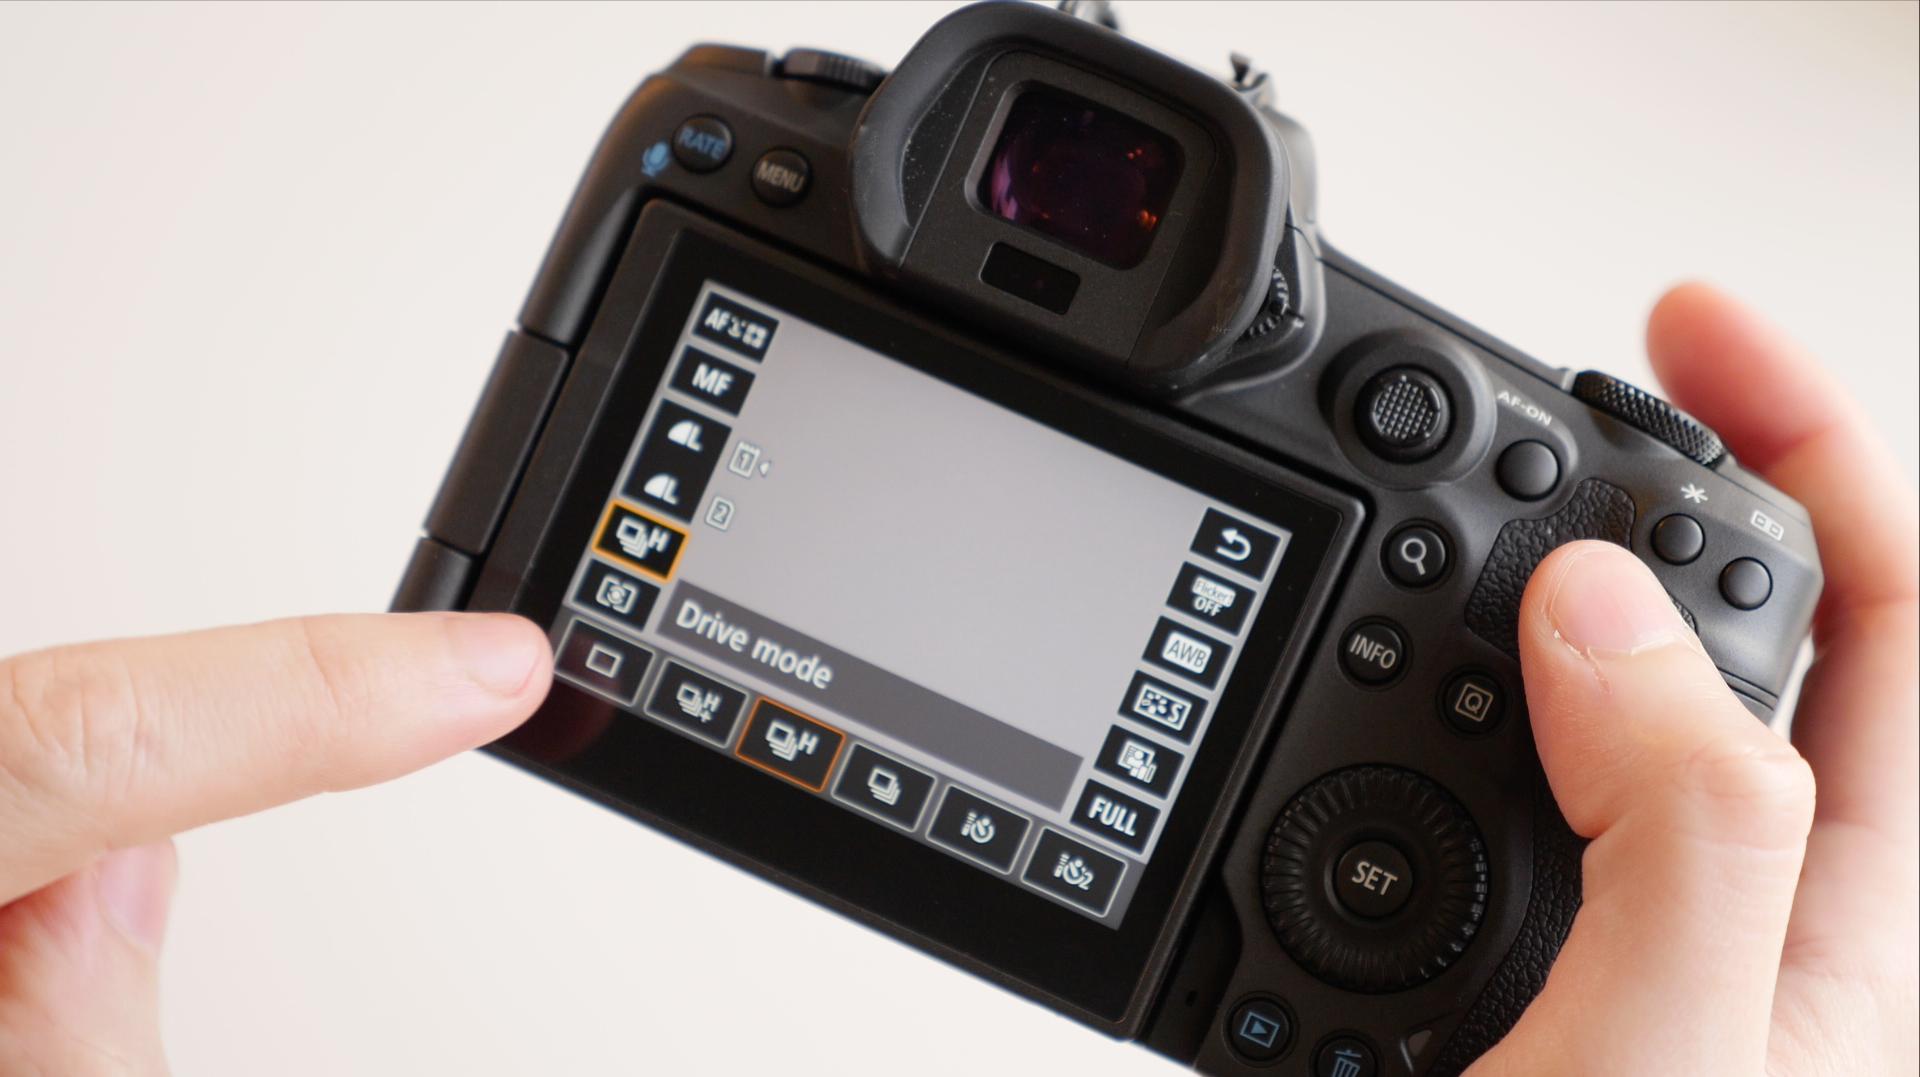 Touchscreen controls on EOS R5